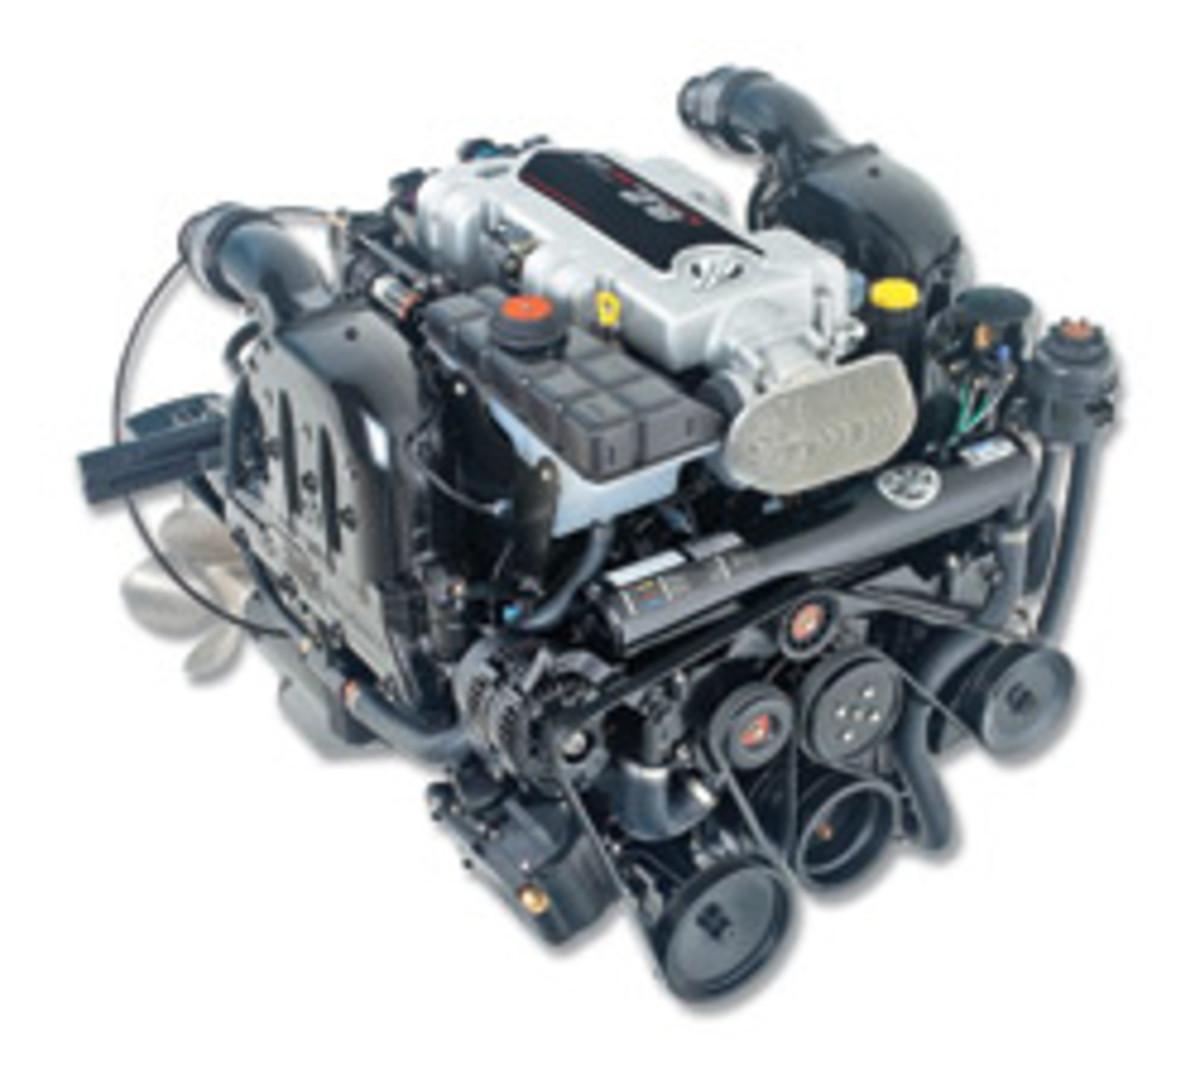 56_engine_01